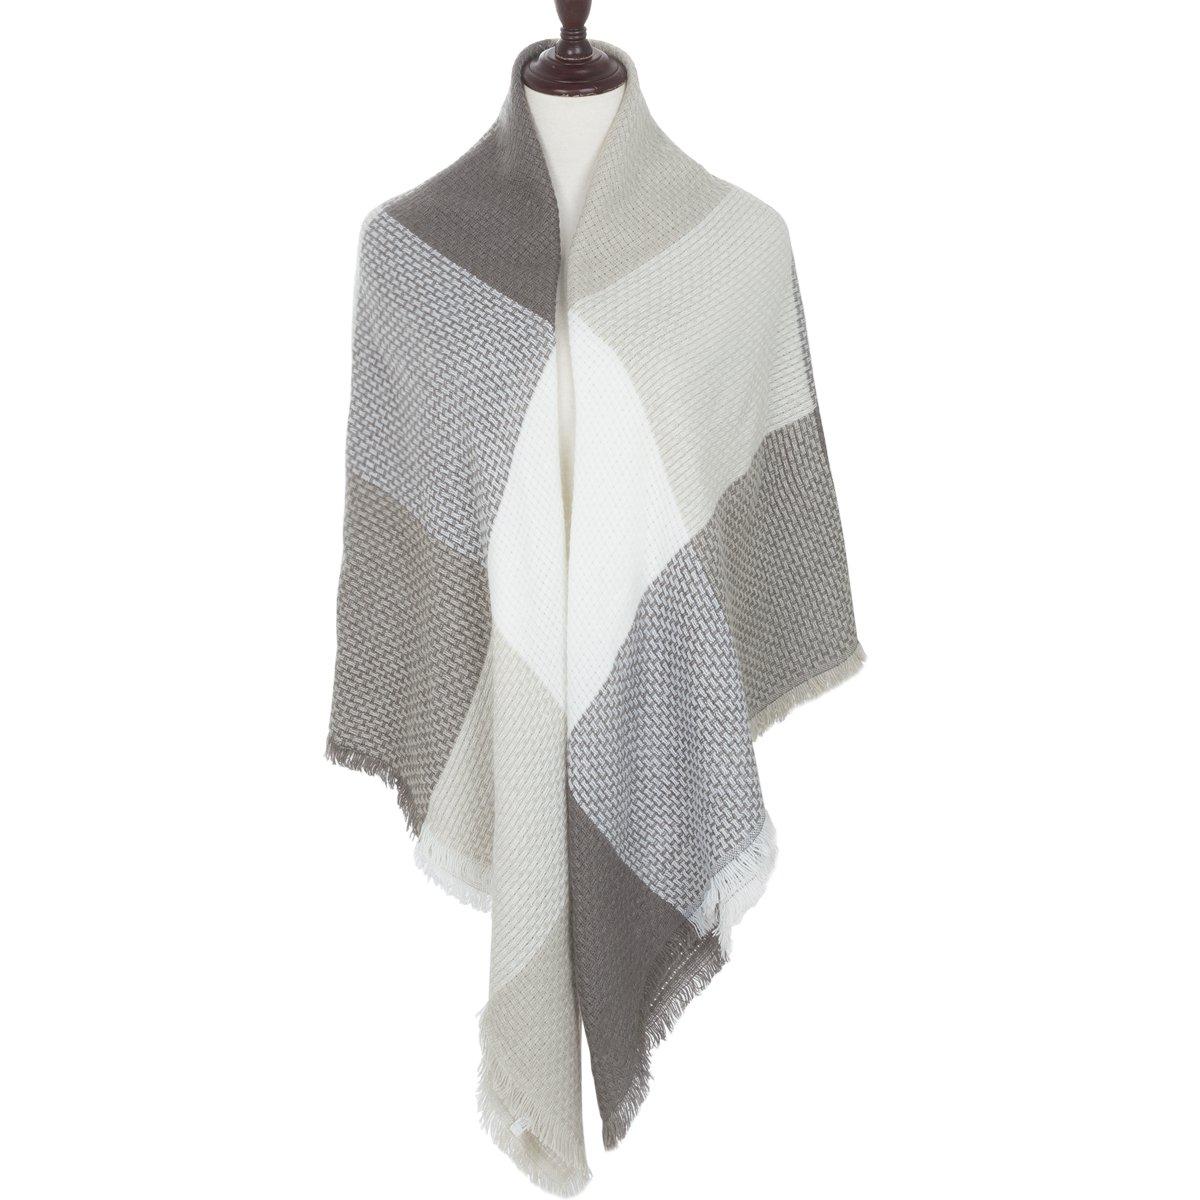 169a8ef6ec5 Women Square Scarf Oversized Tartan Blanket Large Winter Warm Shawl ...